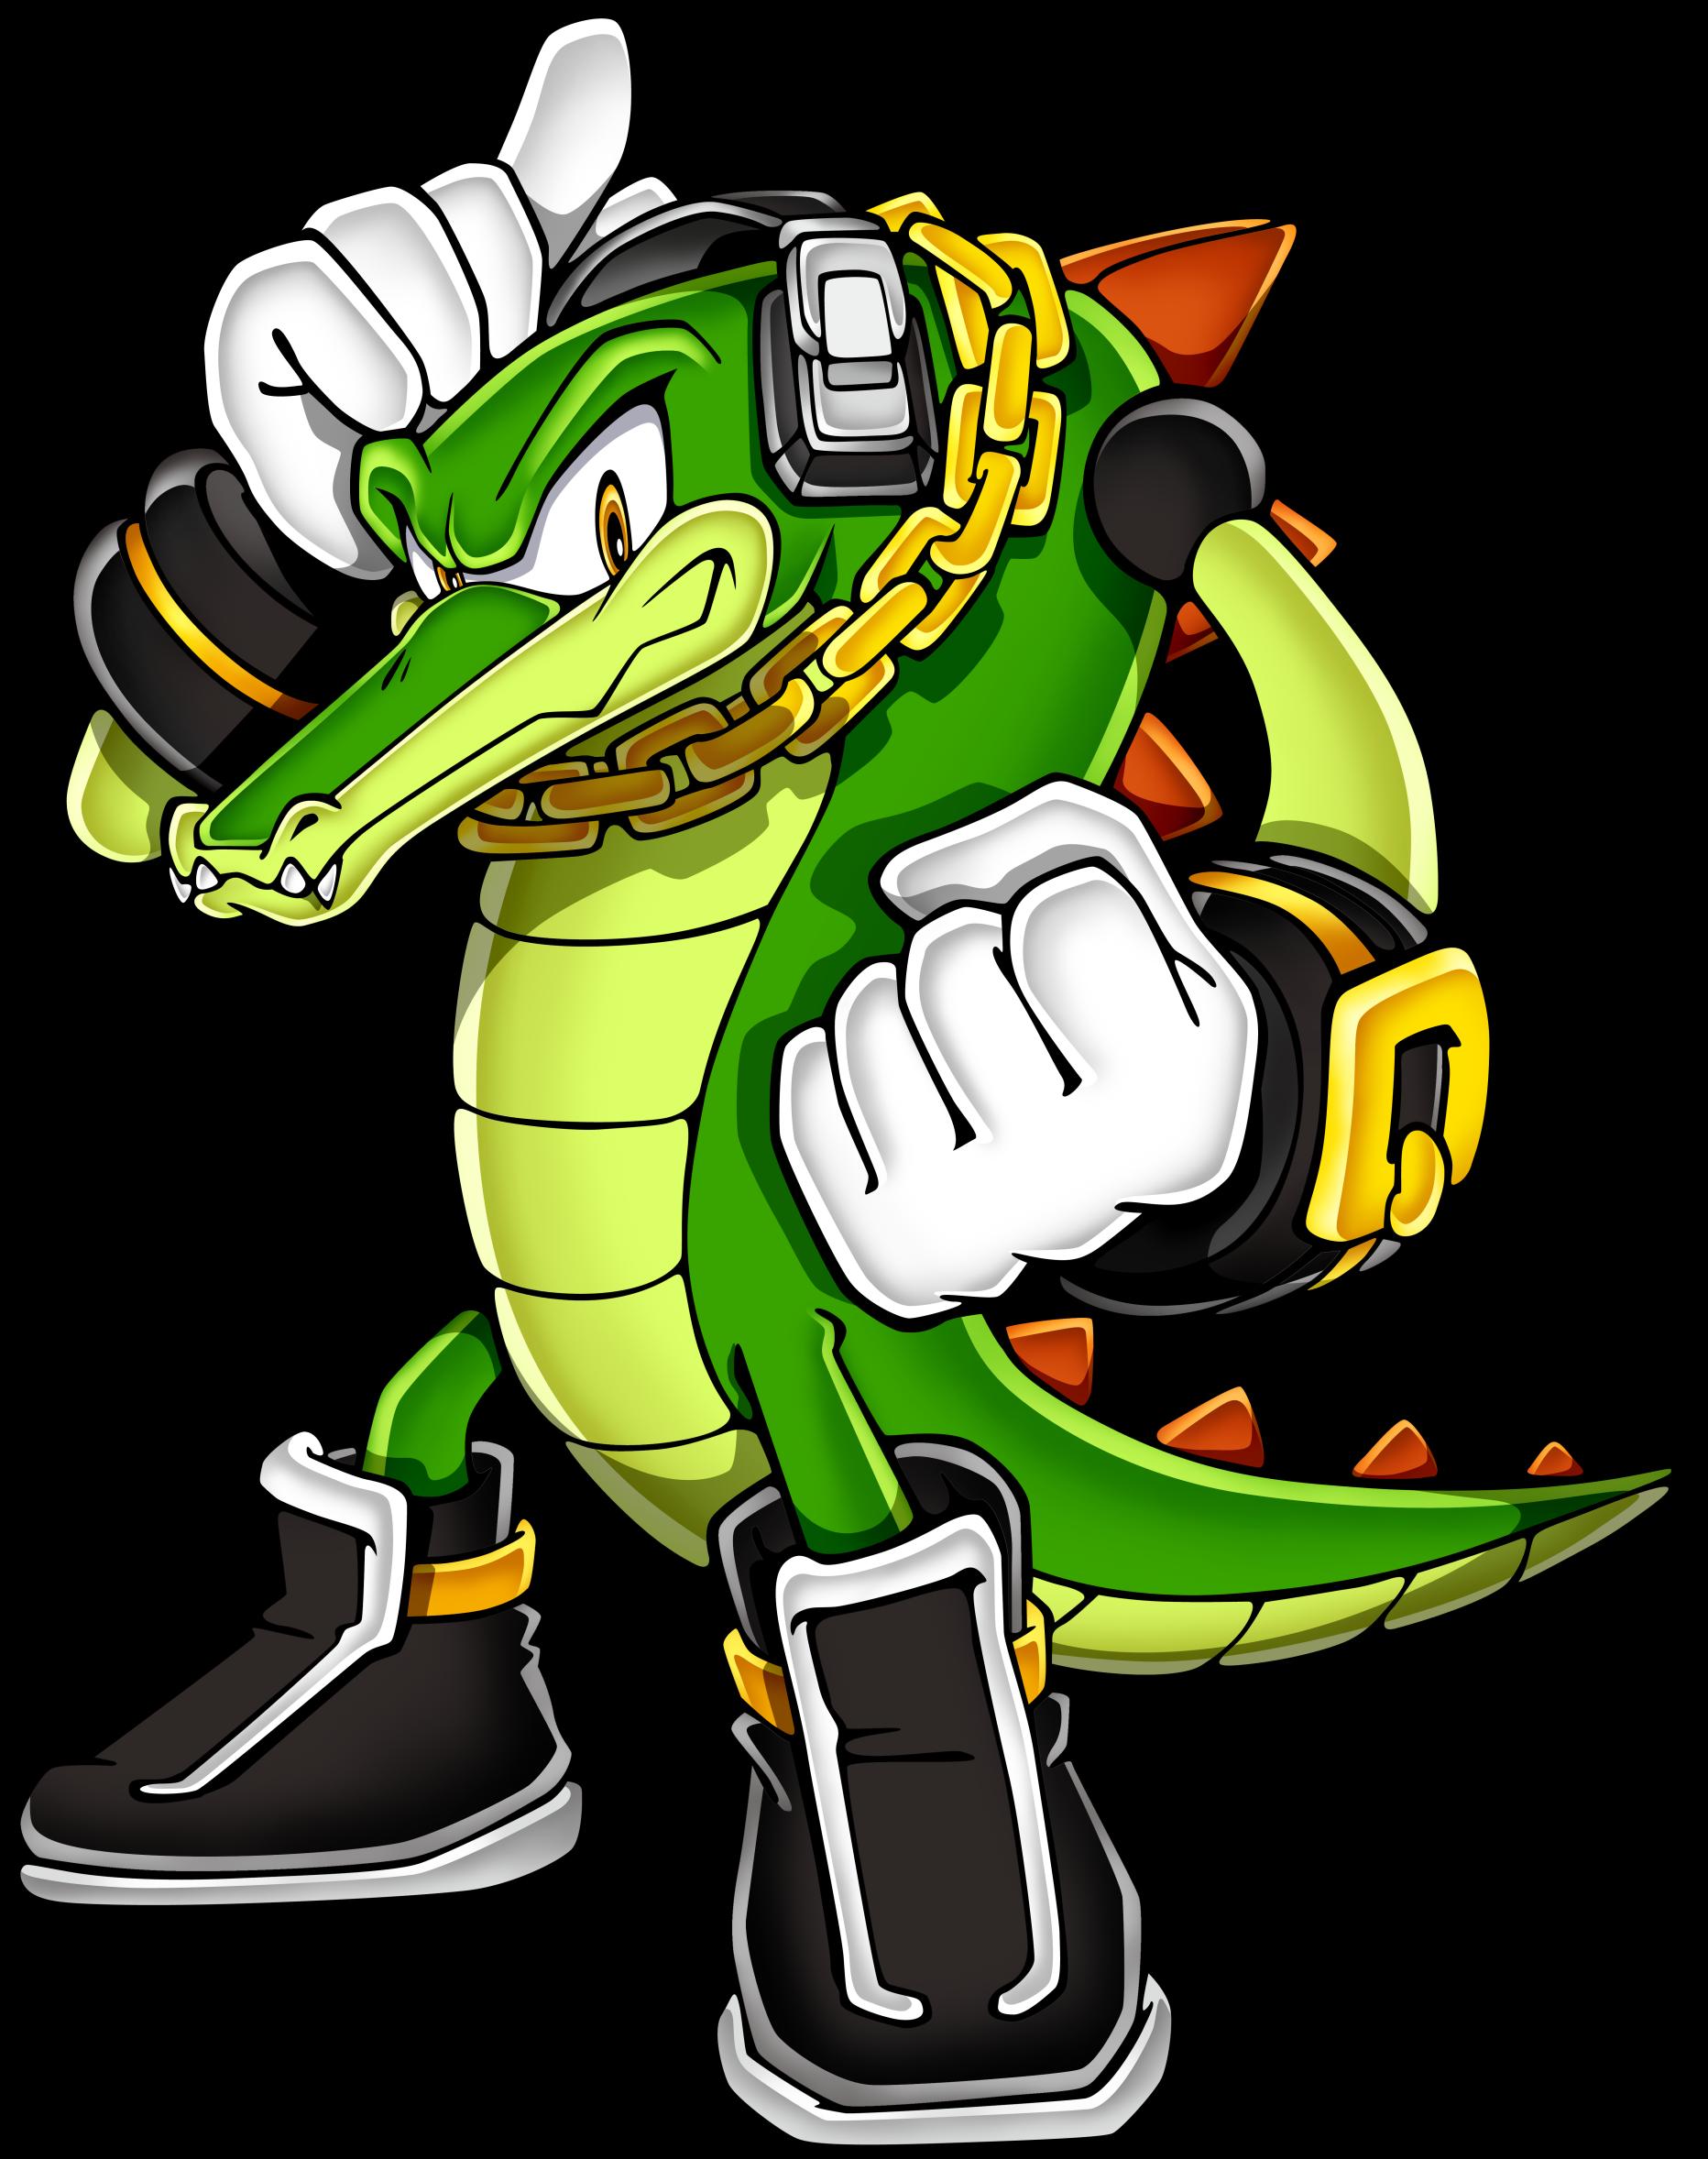 vector the crocodile jaden s adventures wiki fandom powered by wikia rh jadensadventures wikia com vector the crocodile age vector the crocodile rom hack